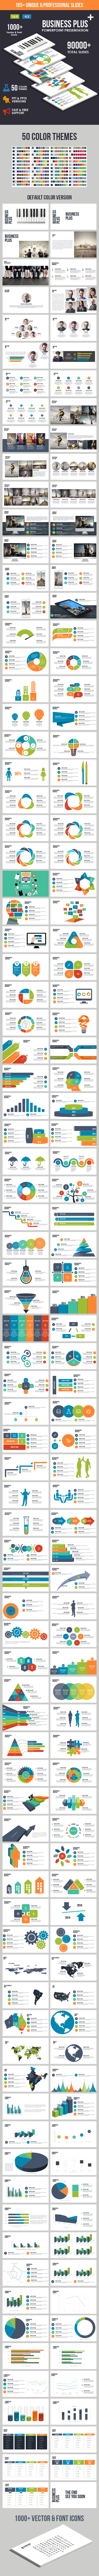 Business Plus Powerpoint Presentation Template